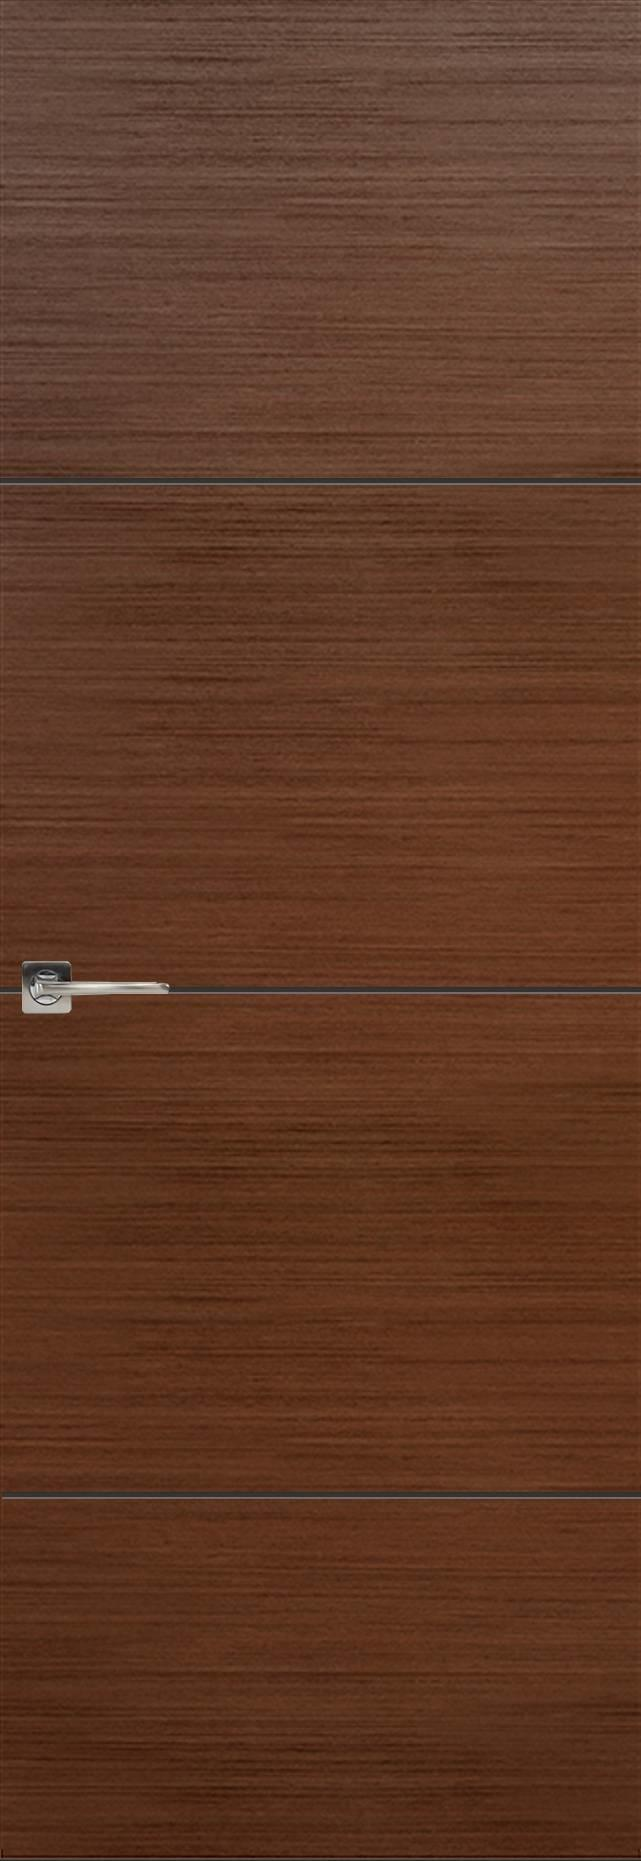 Tivoli Г-2 Invisible цвет - Темный орех Без стекла (ДГ)